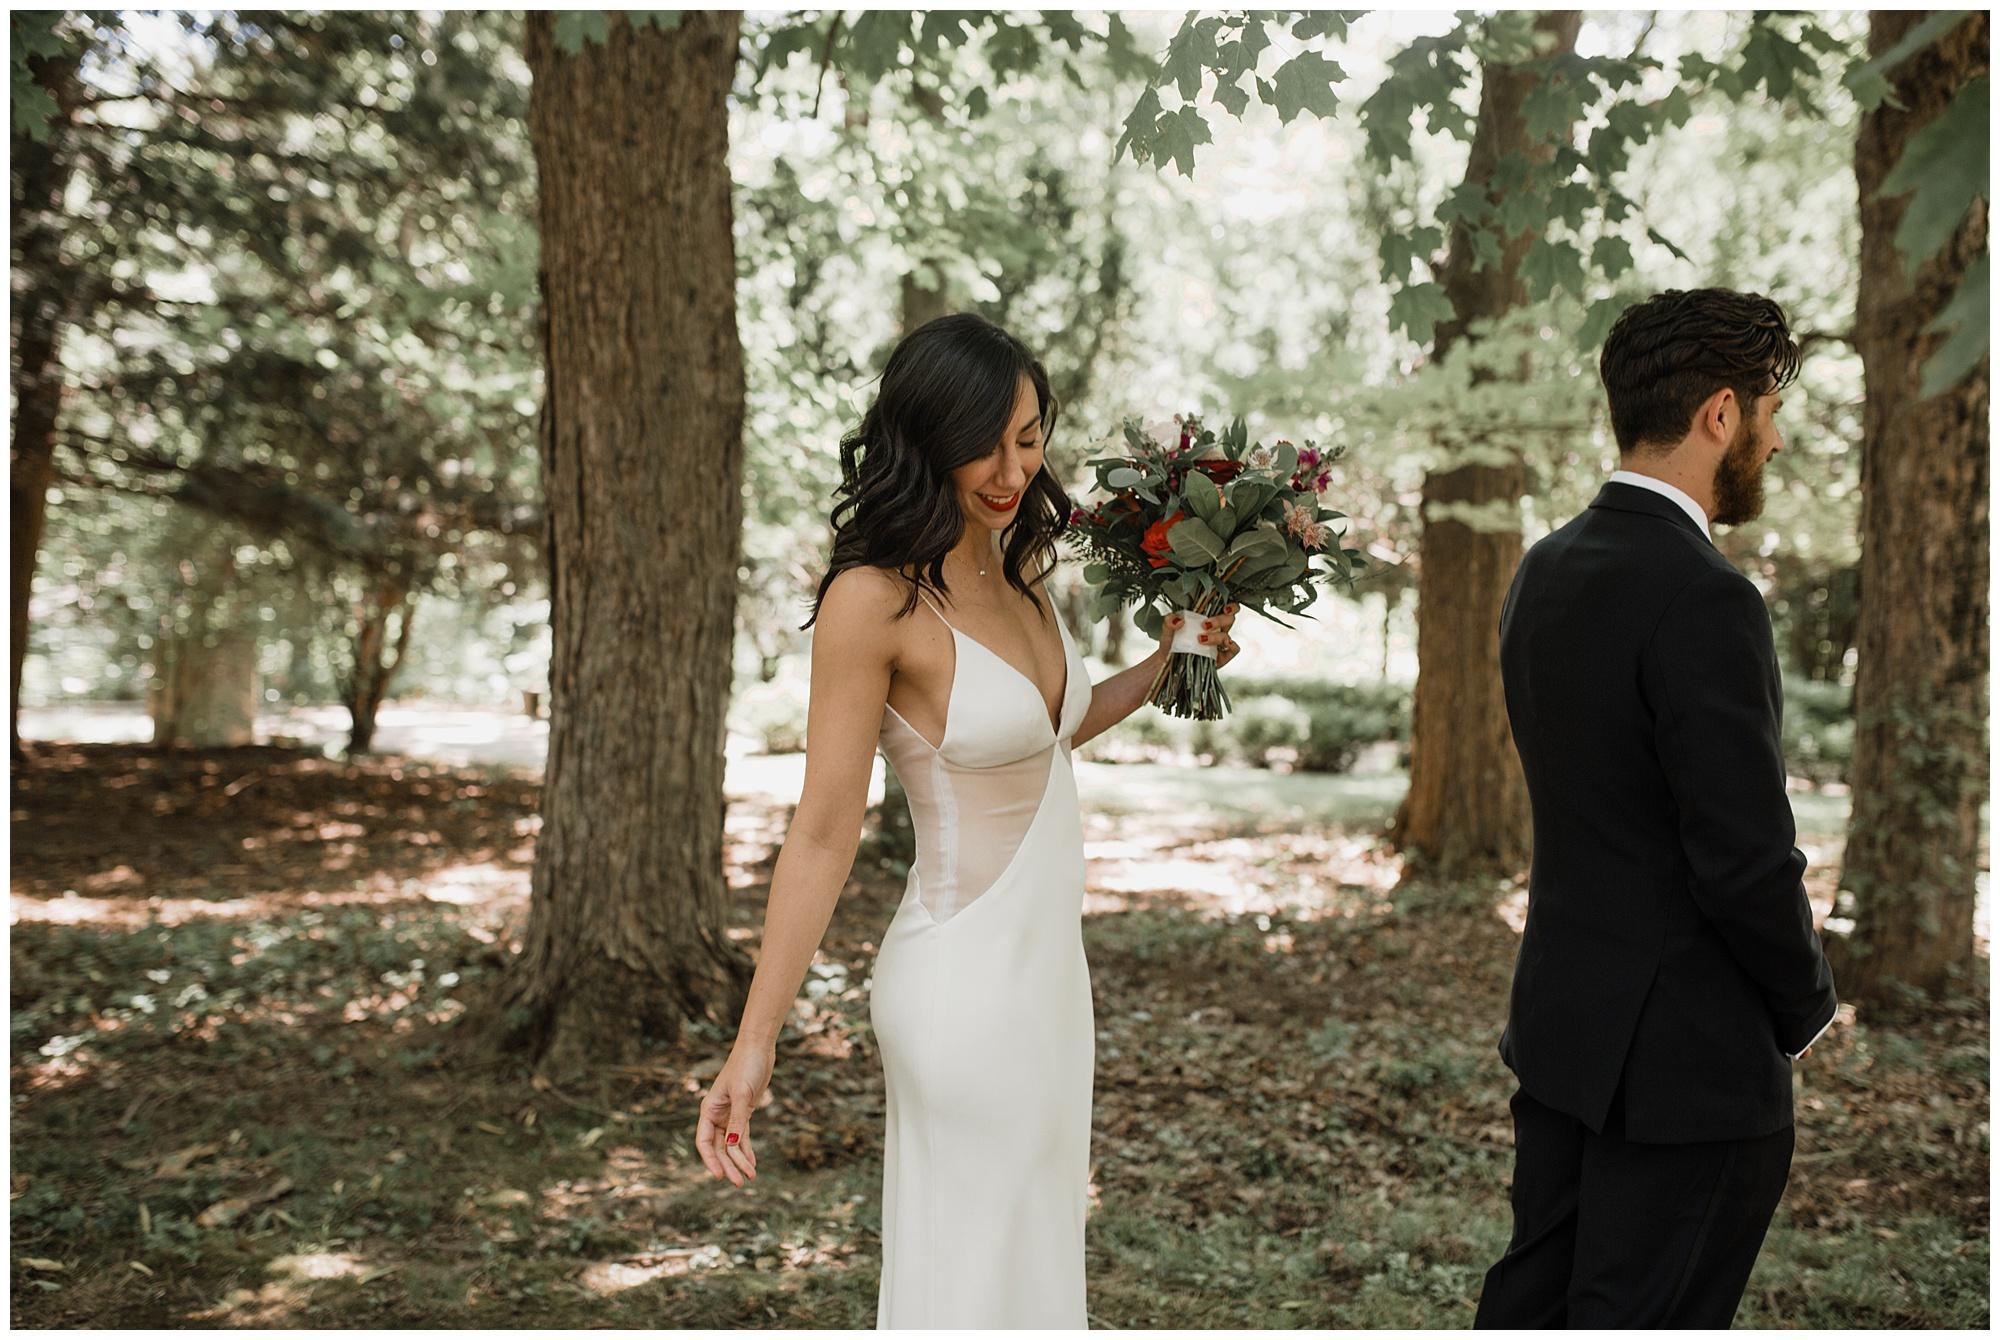 allerton_park_wedding_champaign_il_chicago_wright_photographs_ne_0048.jpg